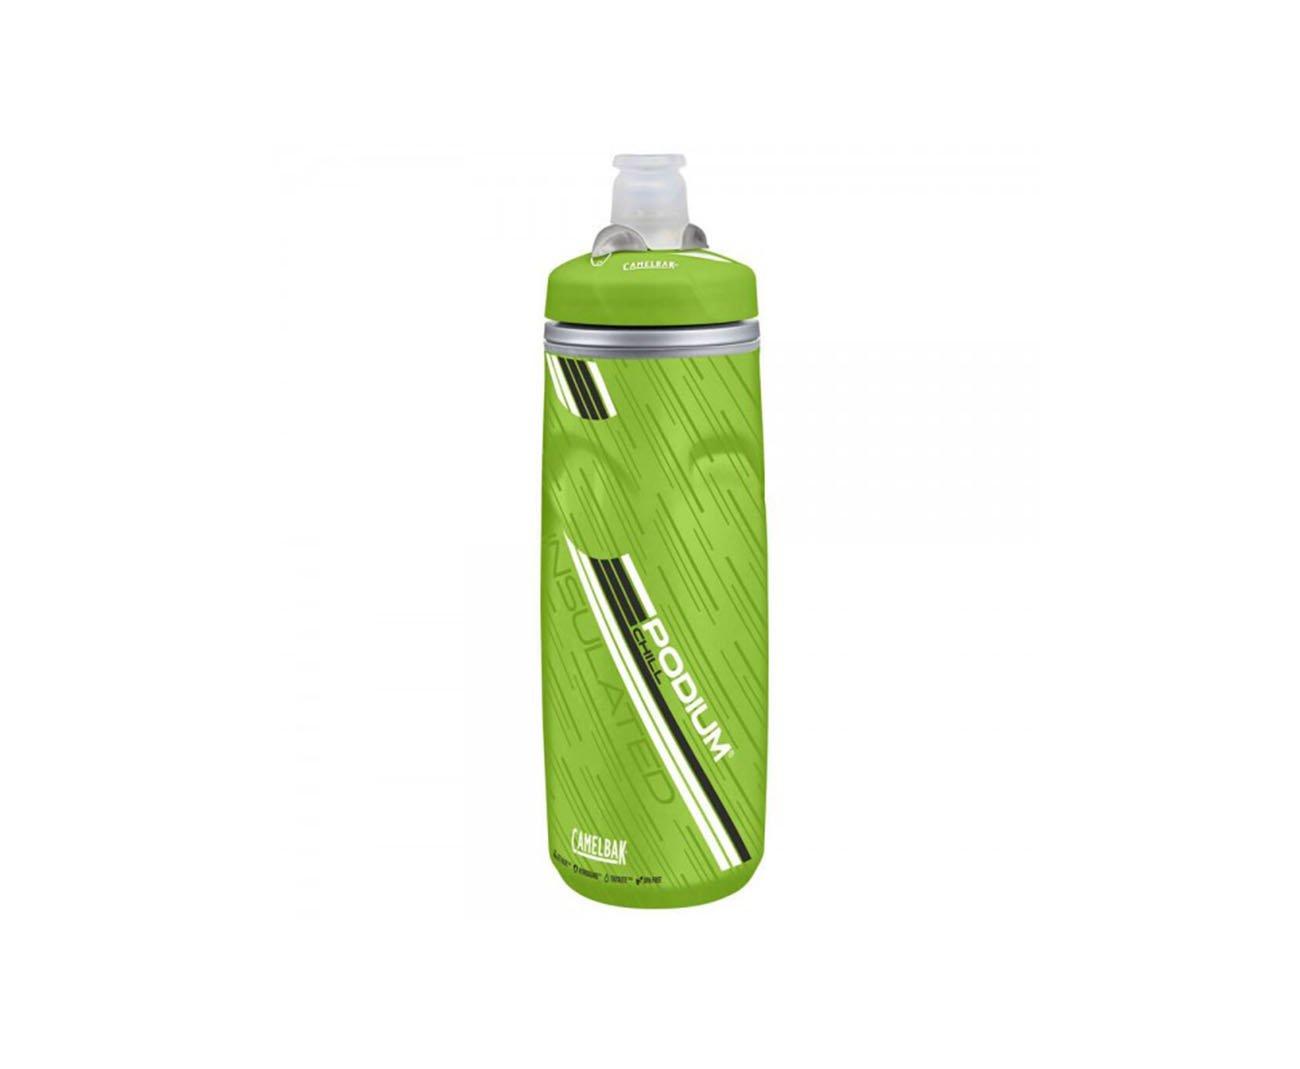 Garrafa Podium Chill 0,61l Cinza E Verde - Camelbak